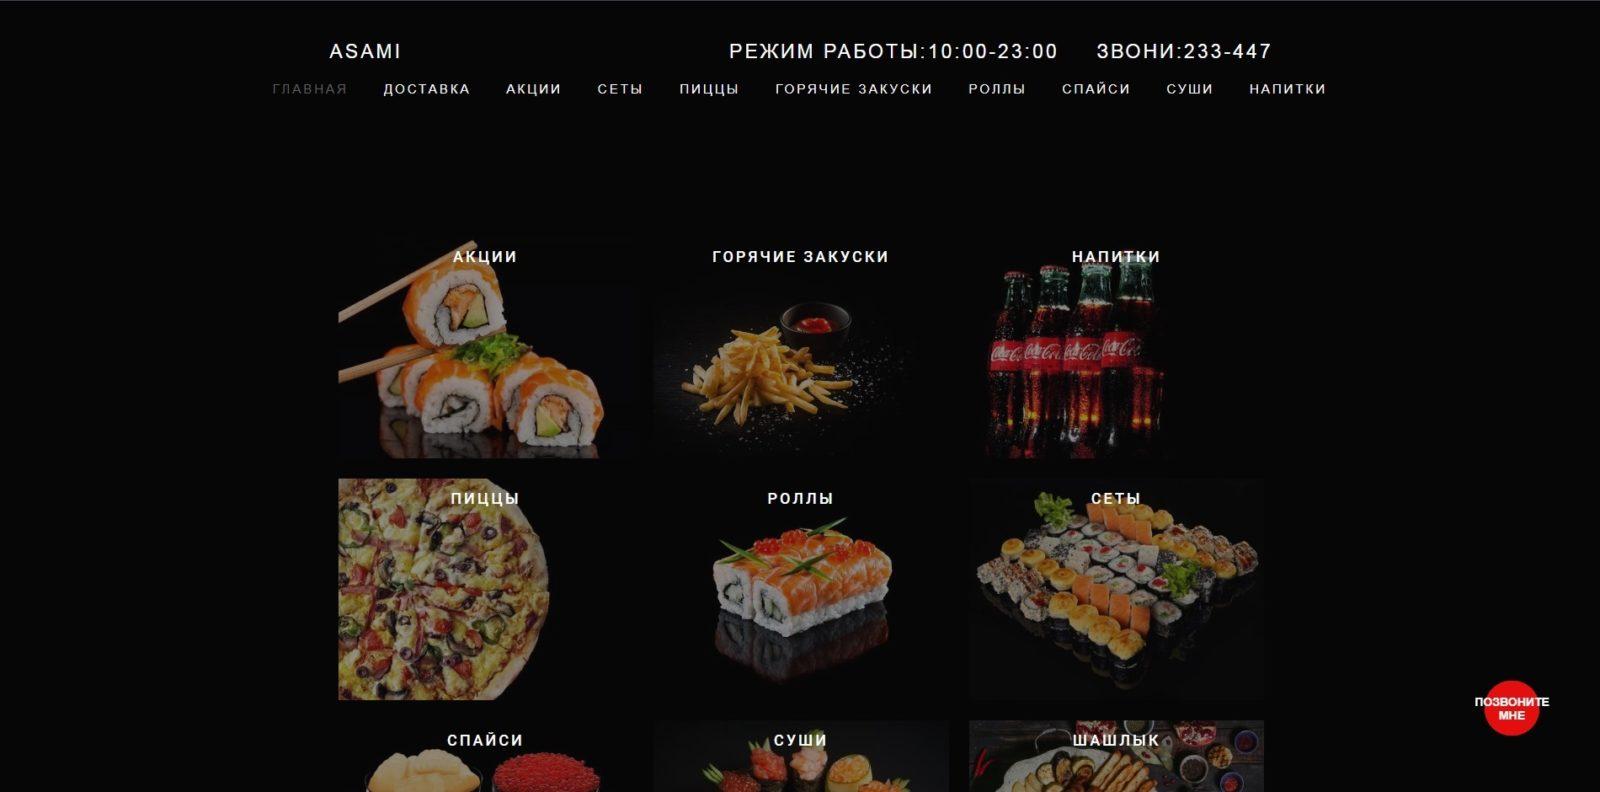 Доставка суши и ролл Asami